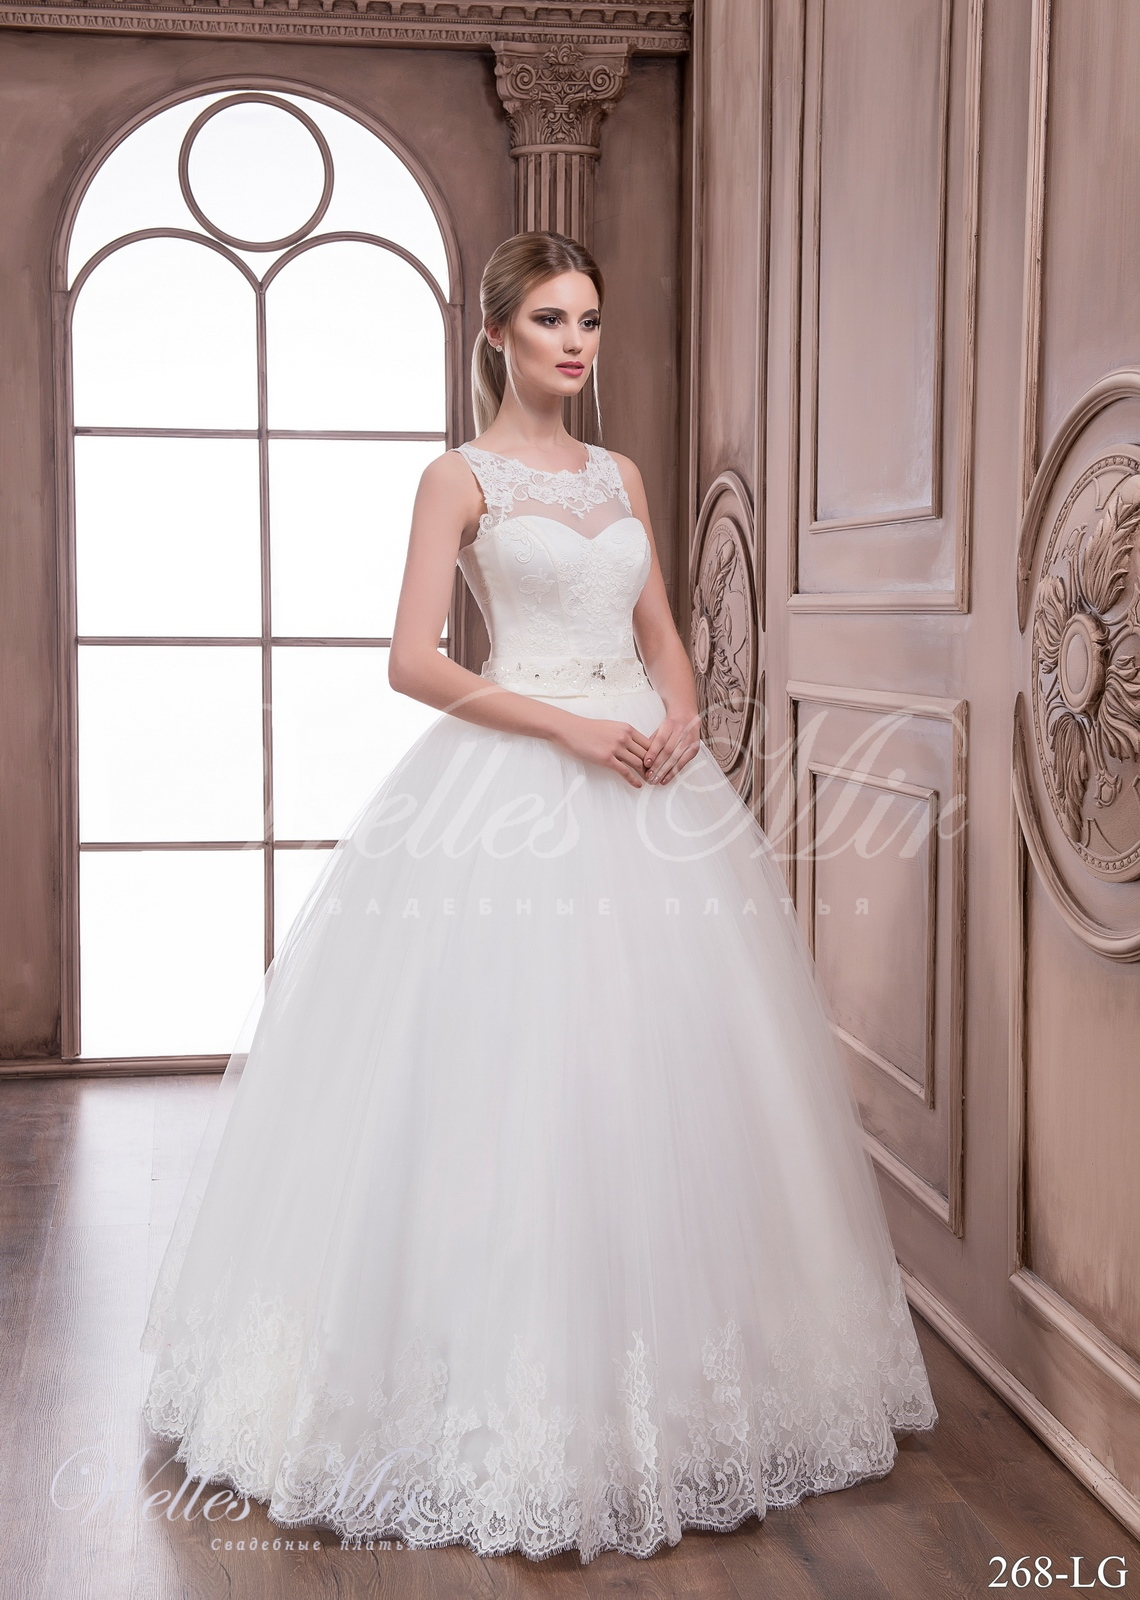 Свадебные платья Tenderness - 268-LG